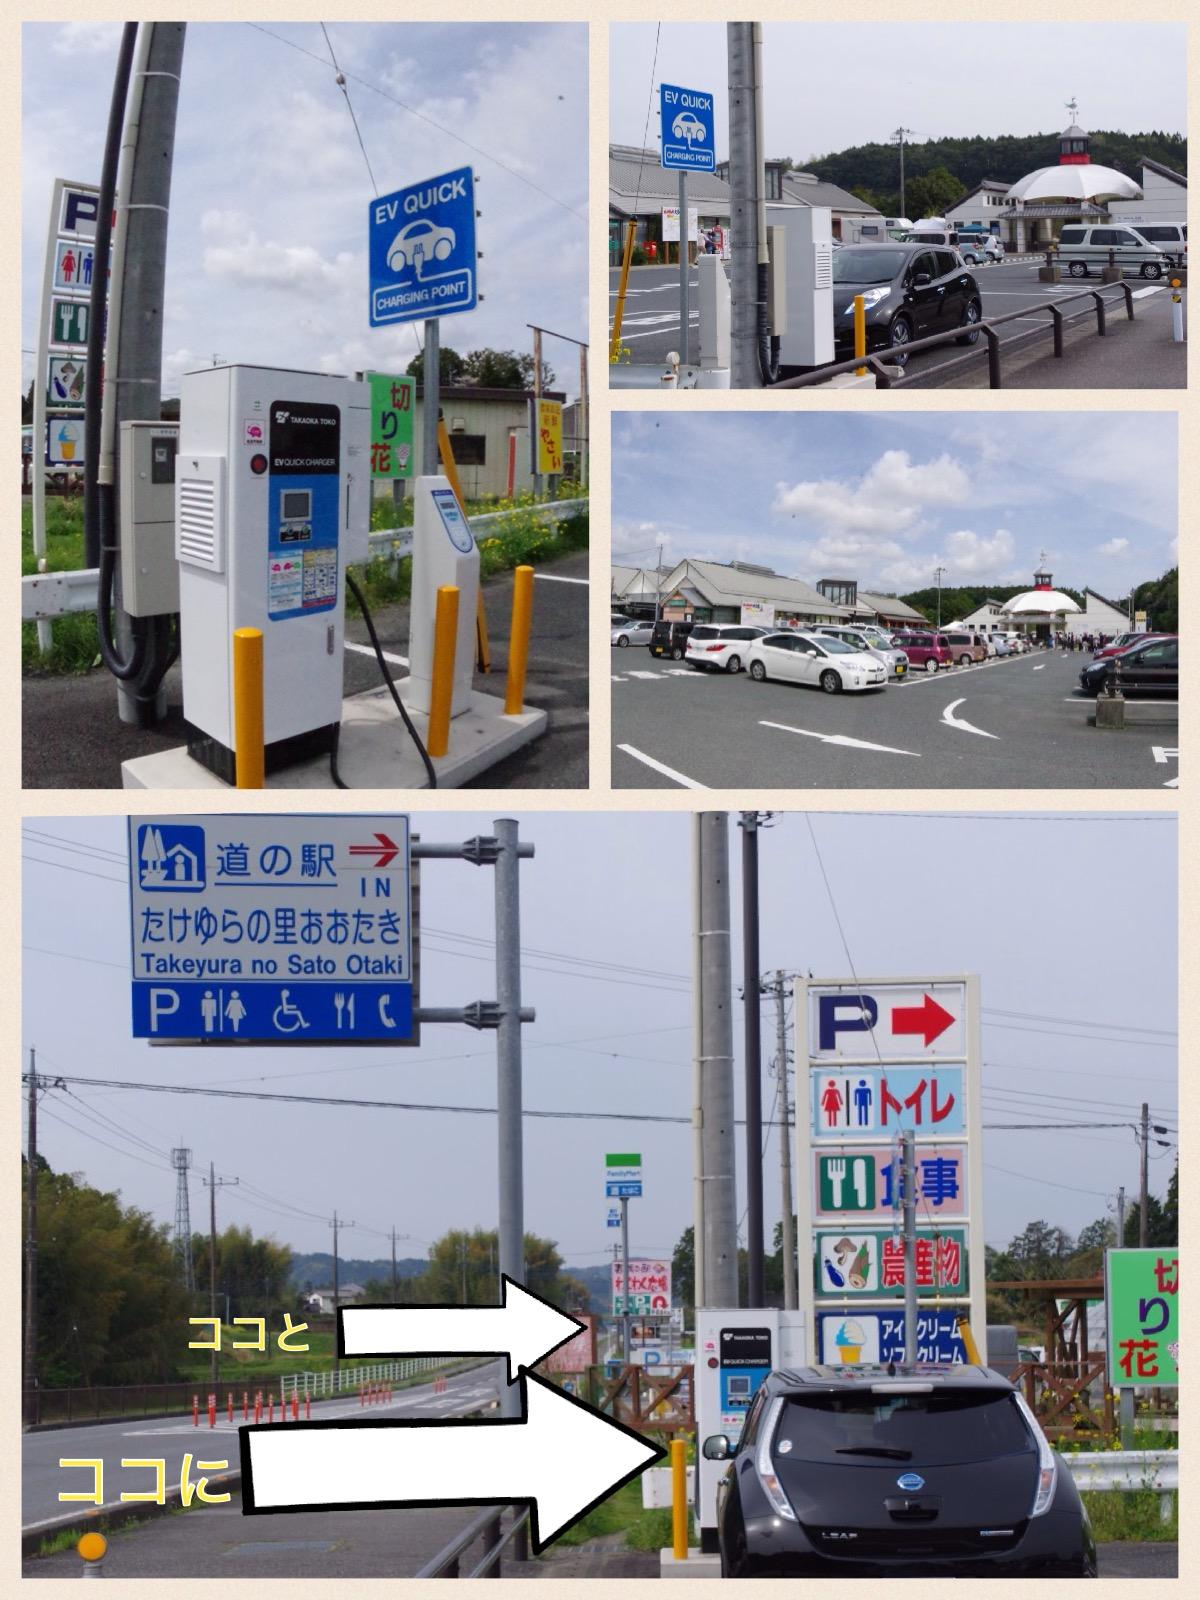 EV充電スポット 道の駅たけゆらの里おおたき 大多喜